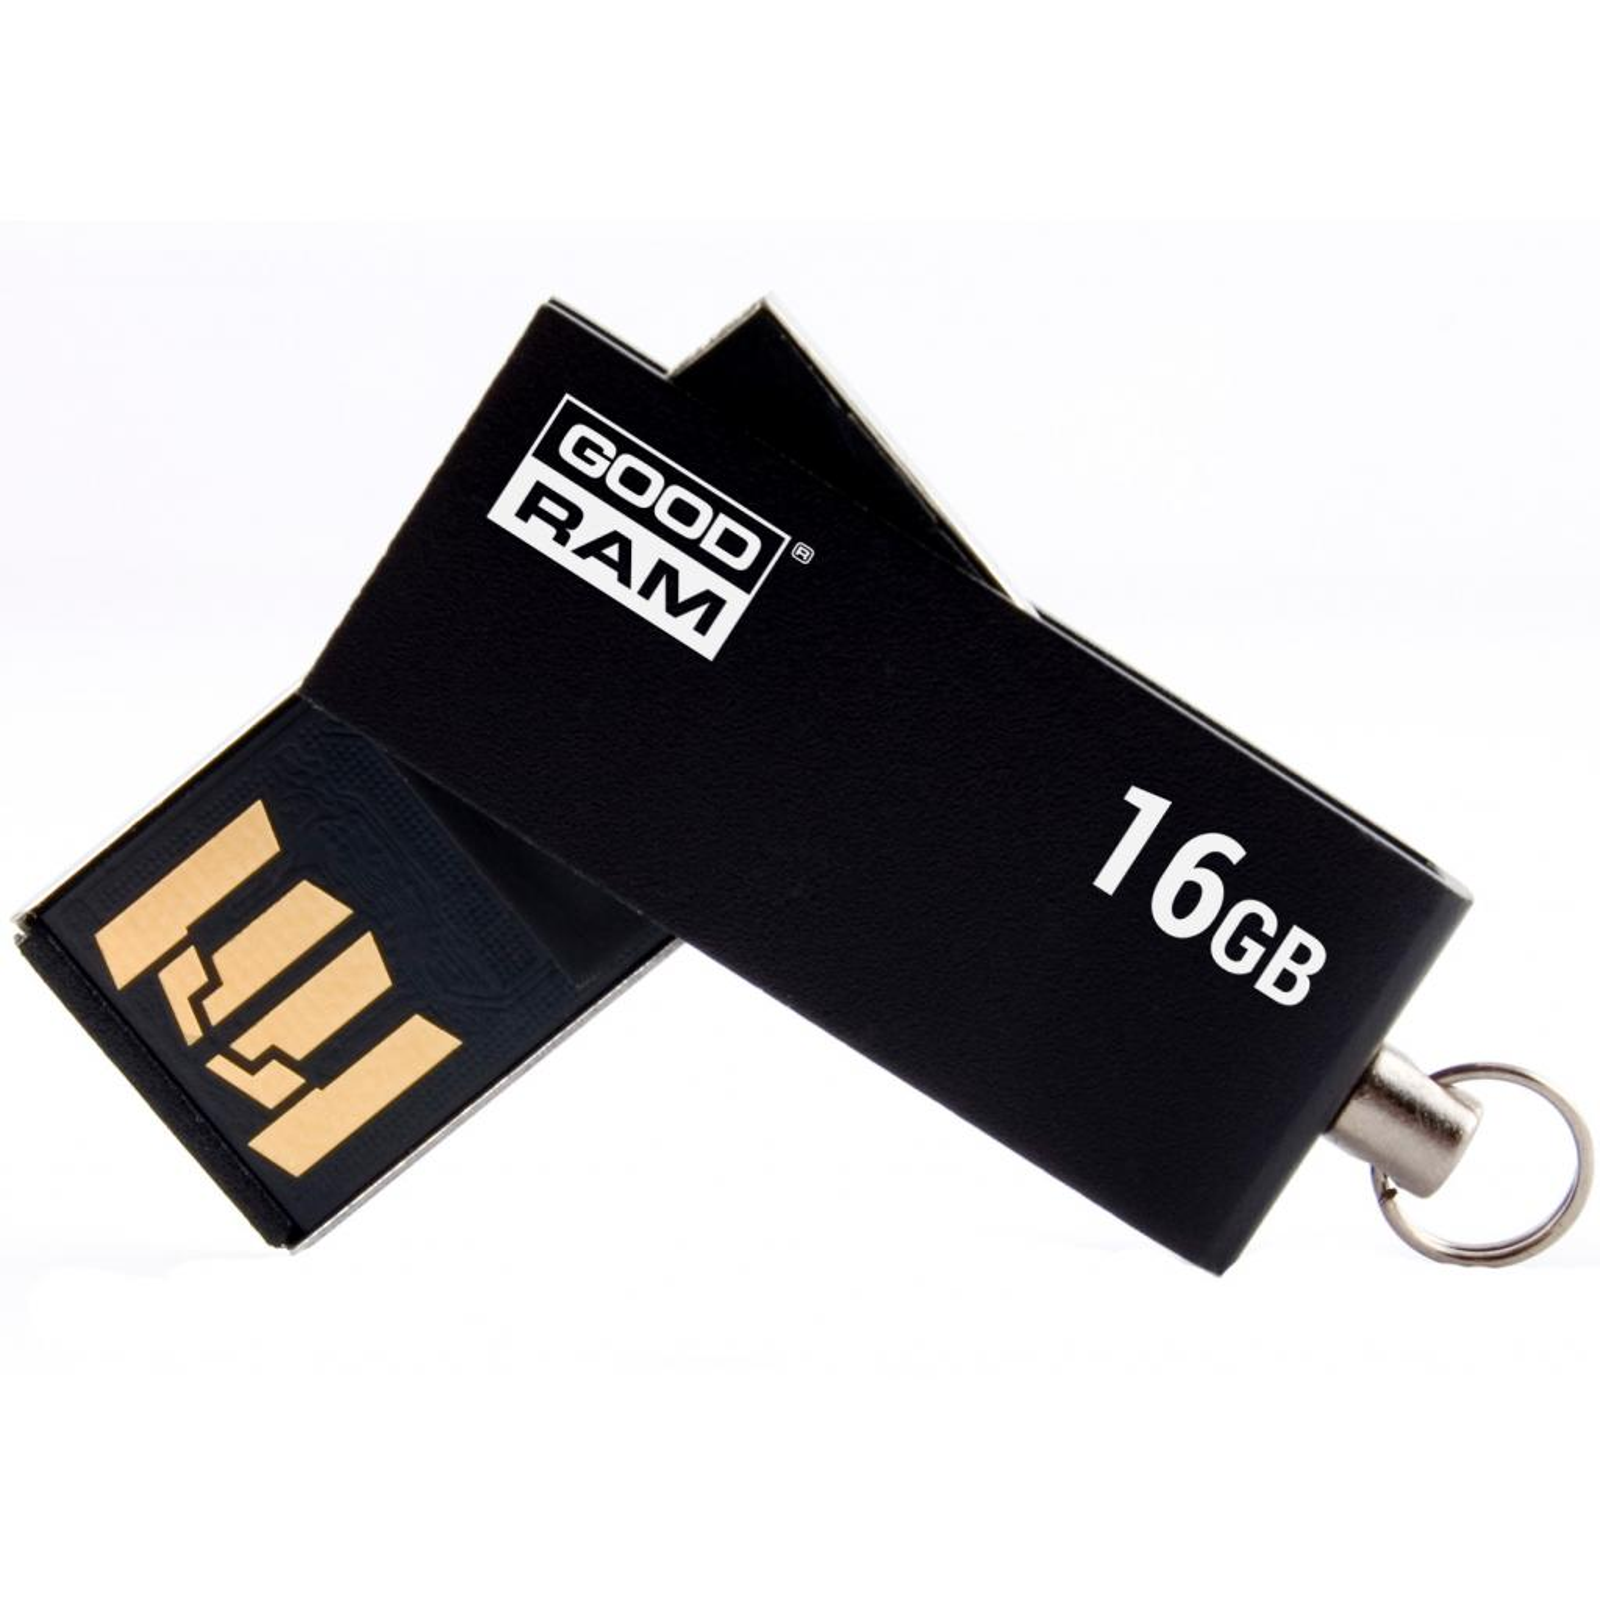 USB флеш накопитель Goodram 32GB Cube Silver USB 2.0 (PD32GH2GRCUSR9) изображение 2